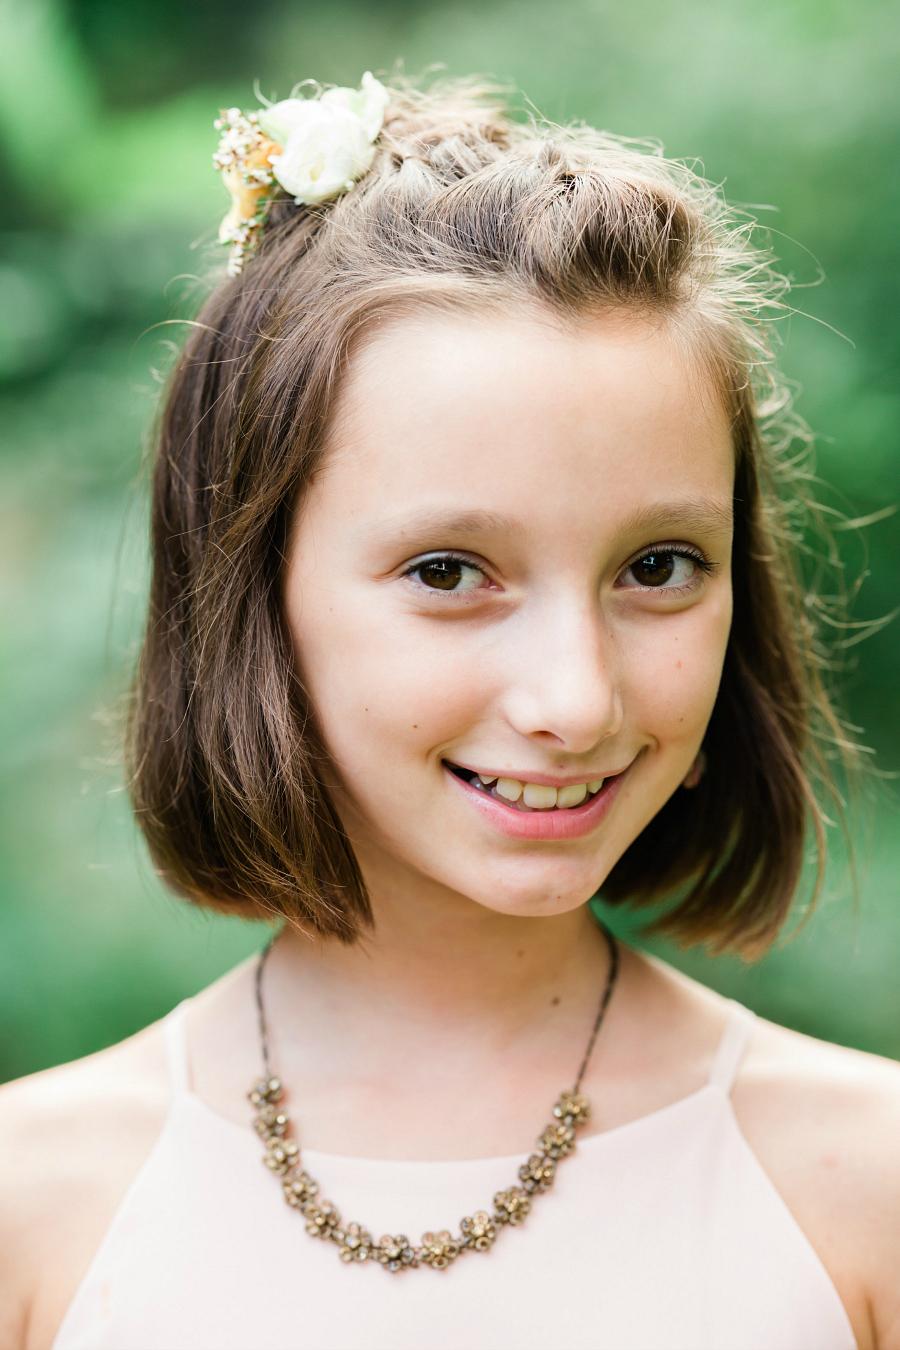 Junior Bridesmaid & Groom's Daughter